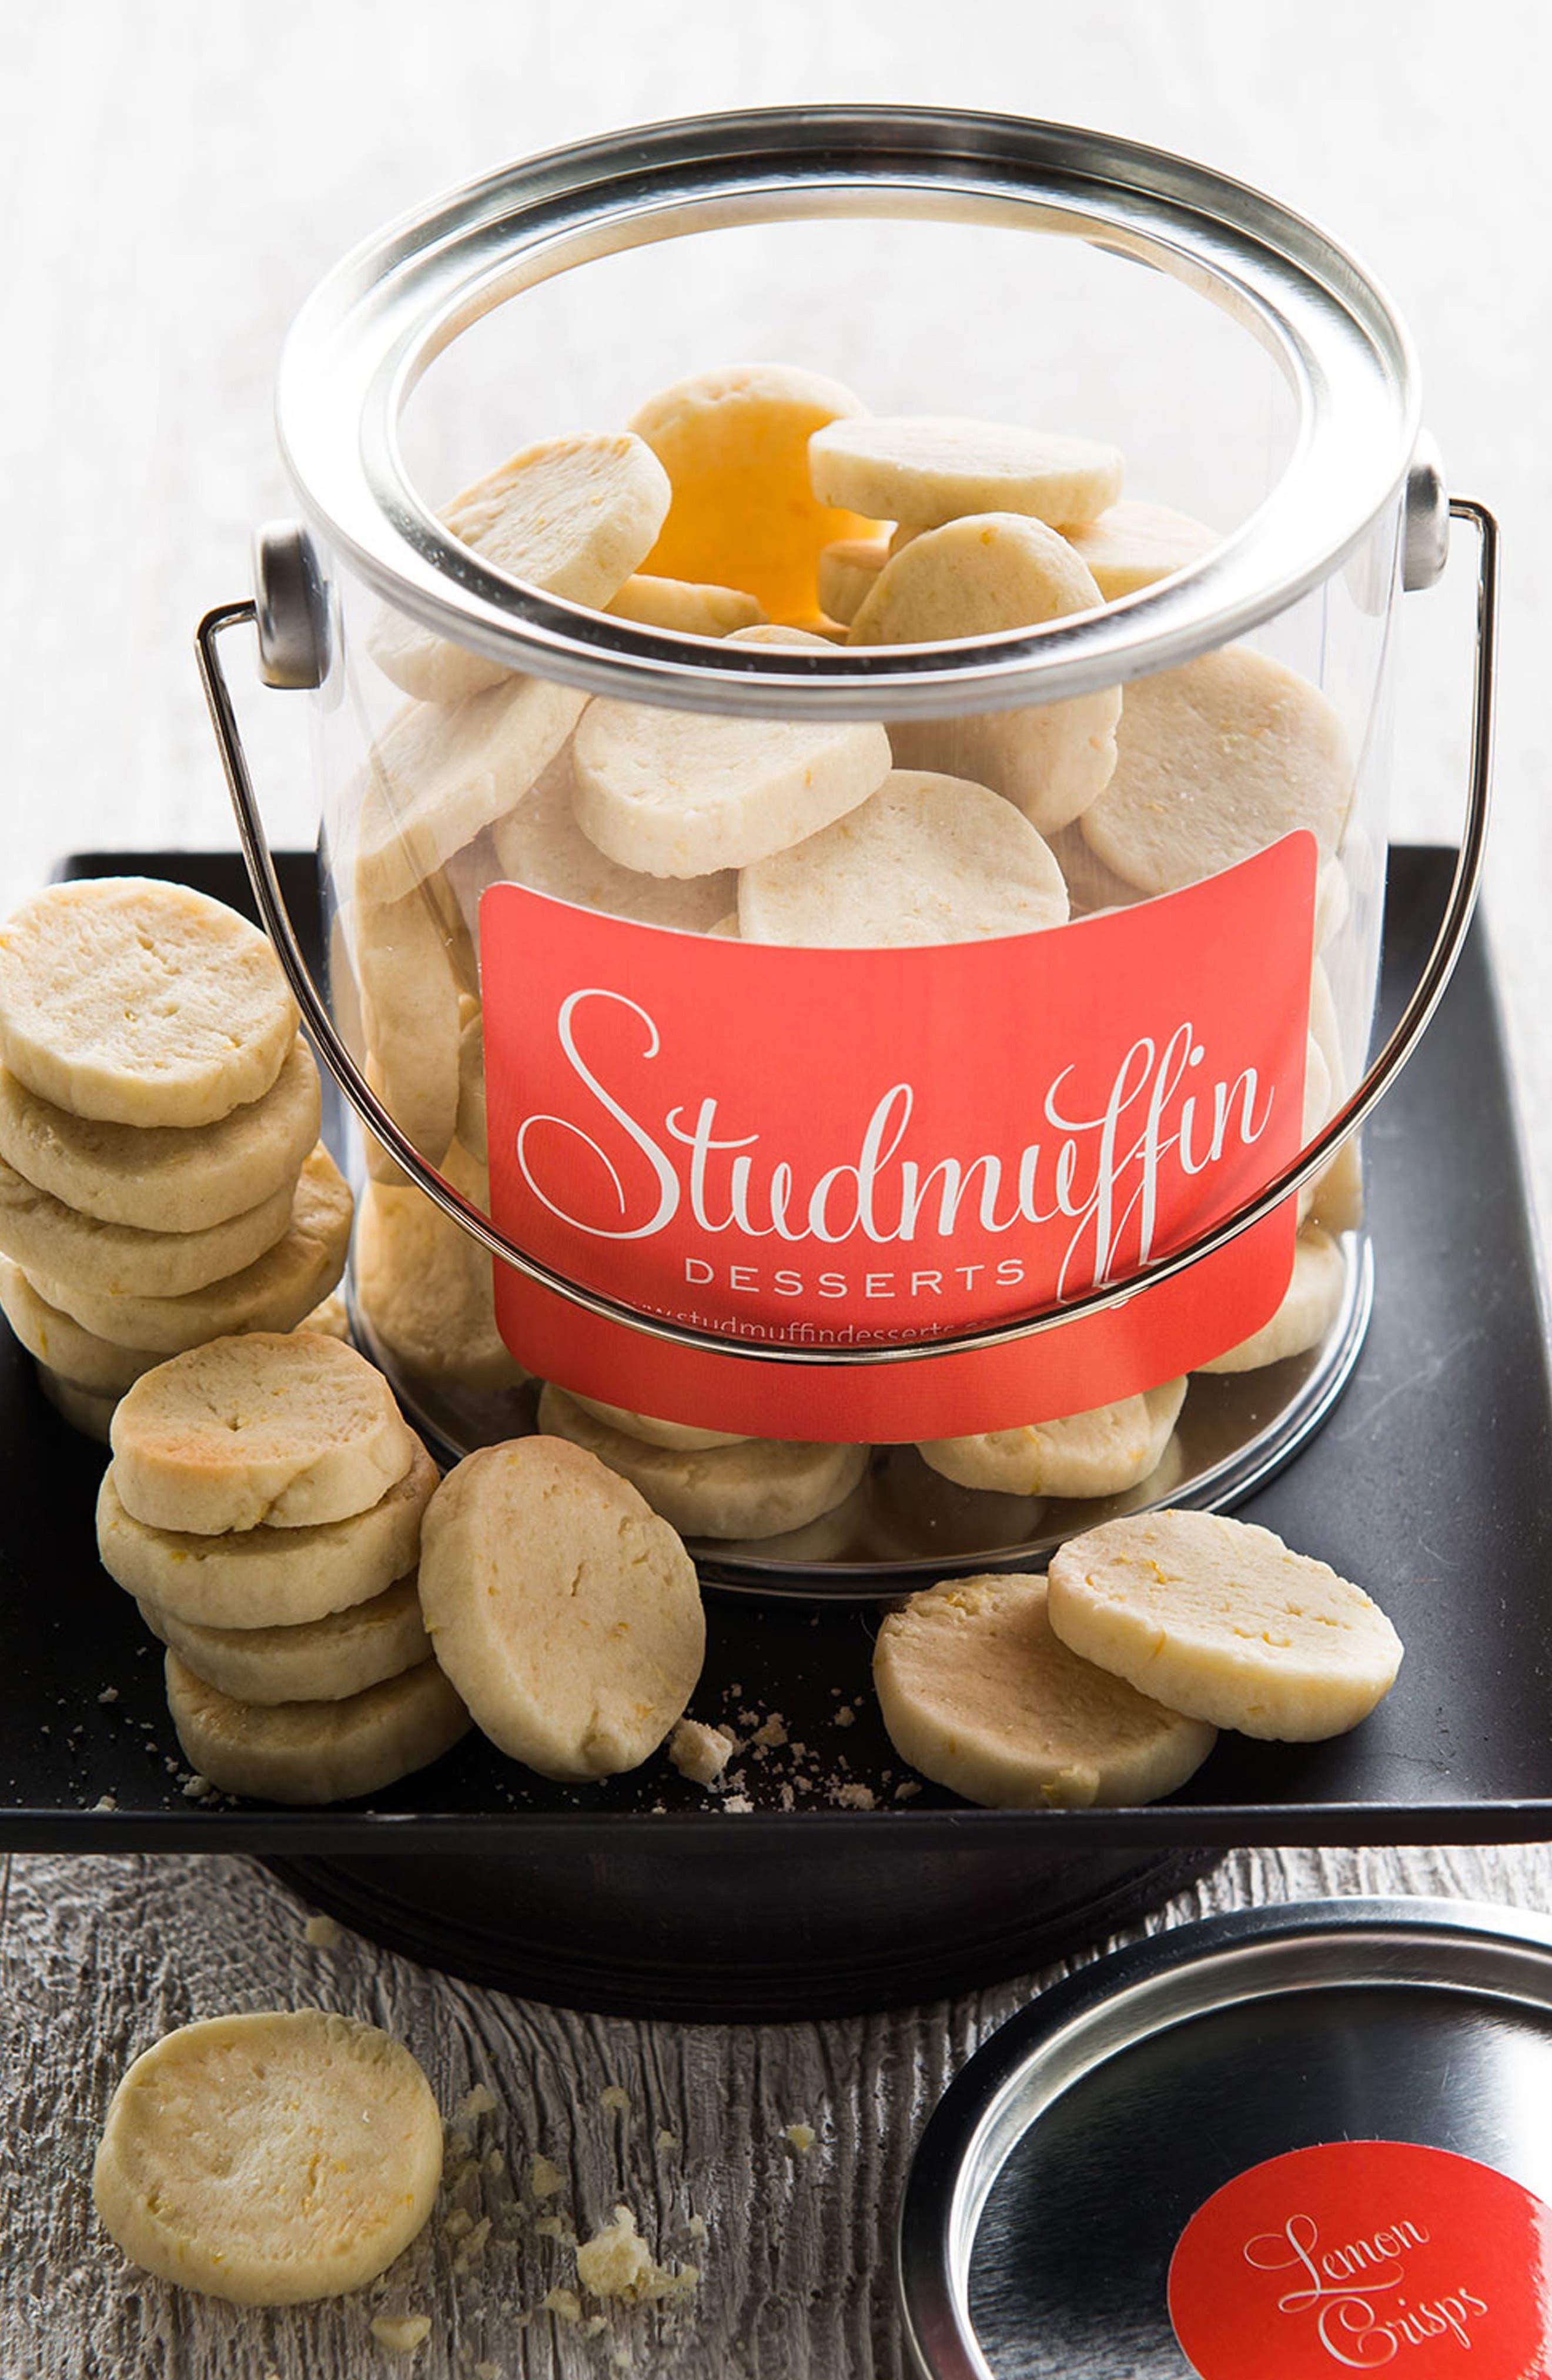 Main Image - Stud Buckets Lemon Crisps Cookie Bites